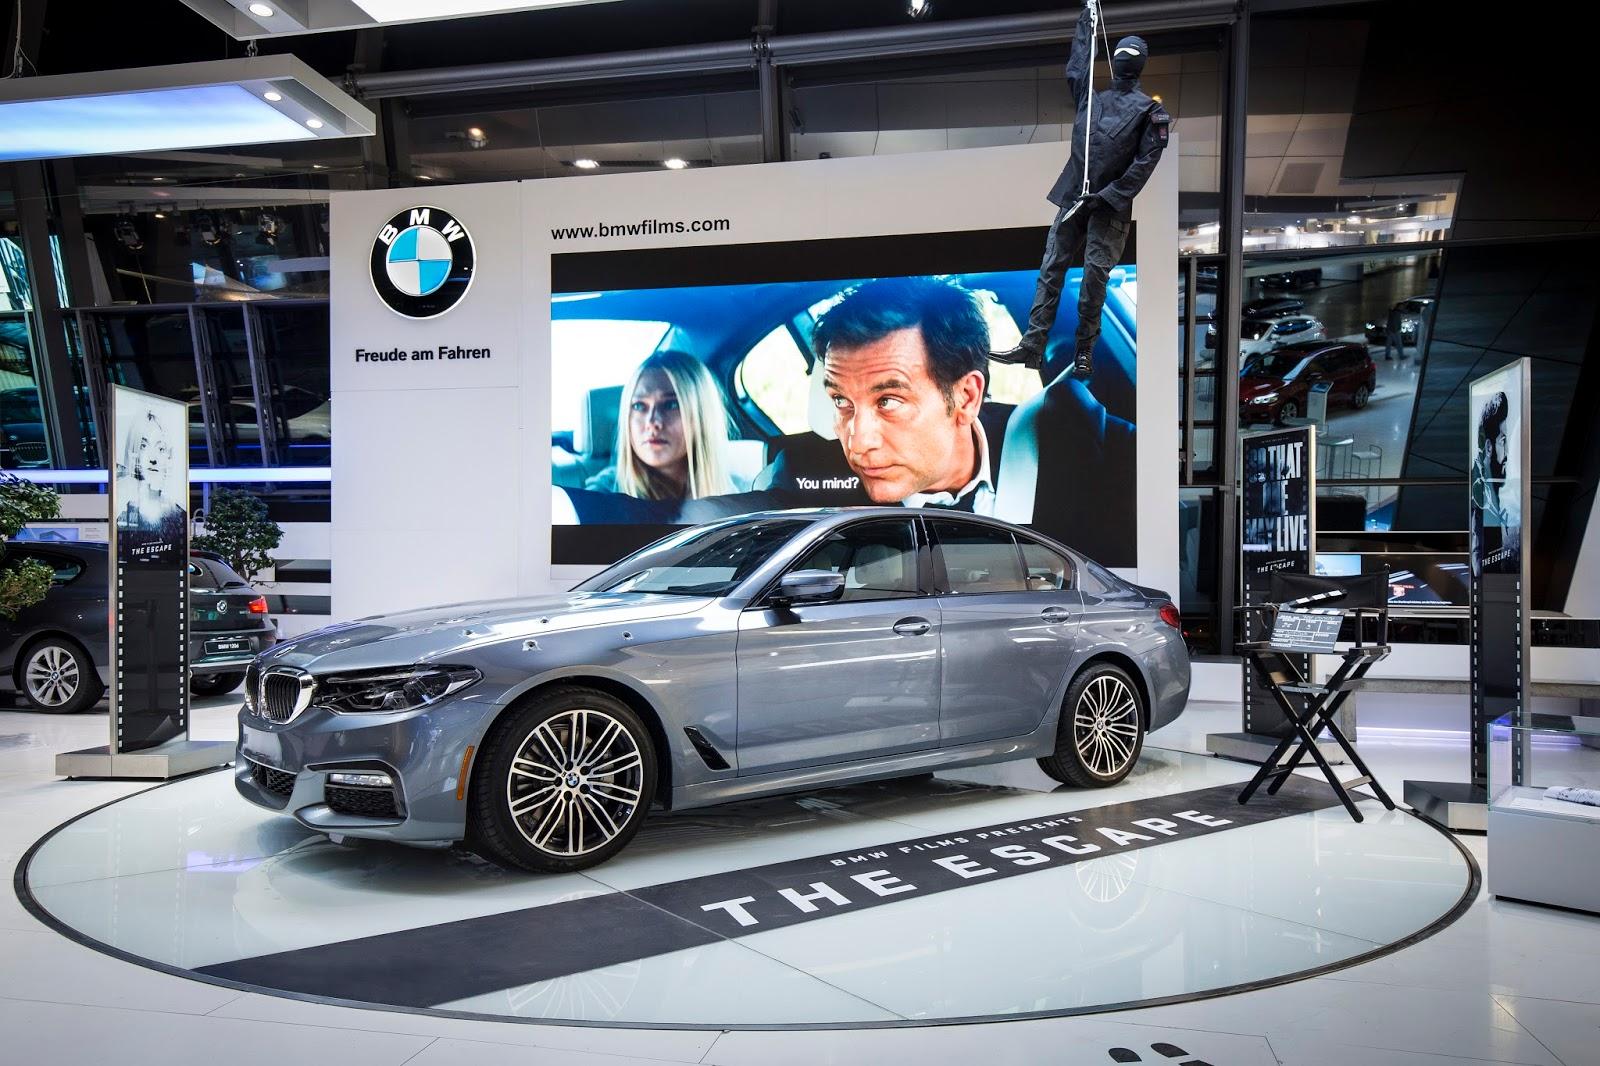 P90248625 highRes the new bmw 5 series Δες την ταινία The Escape, με πρωταγωνιστή την νέα BMW Σειρά 5 BMW, BMW 5, Fun, movie, movie cars, videos, Λανσάρισμα